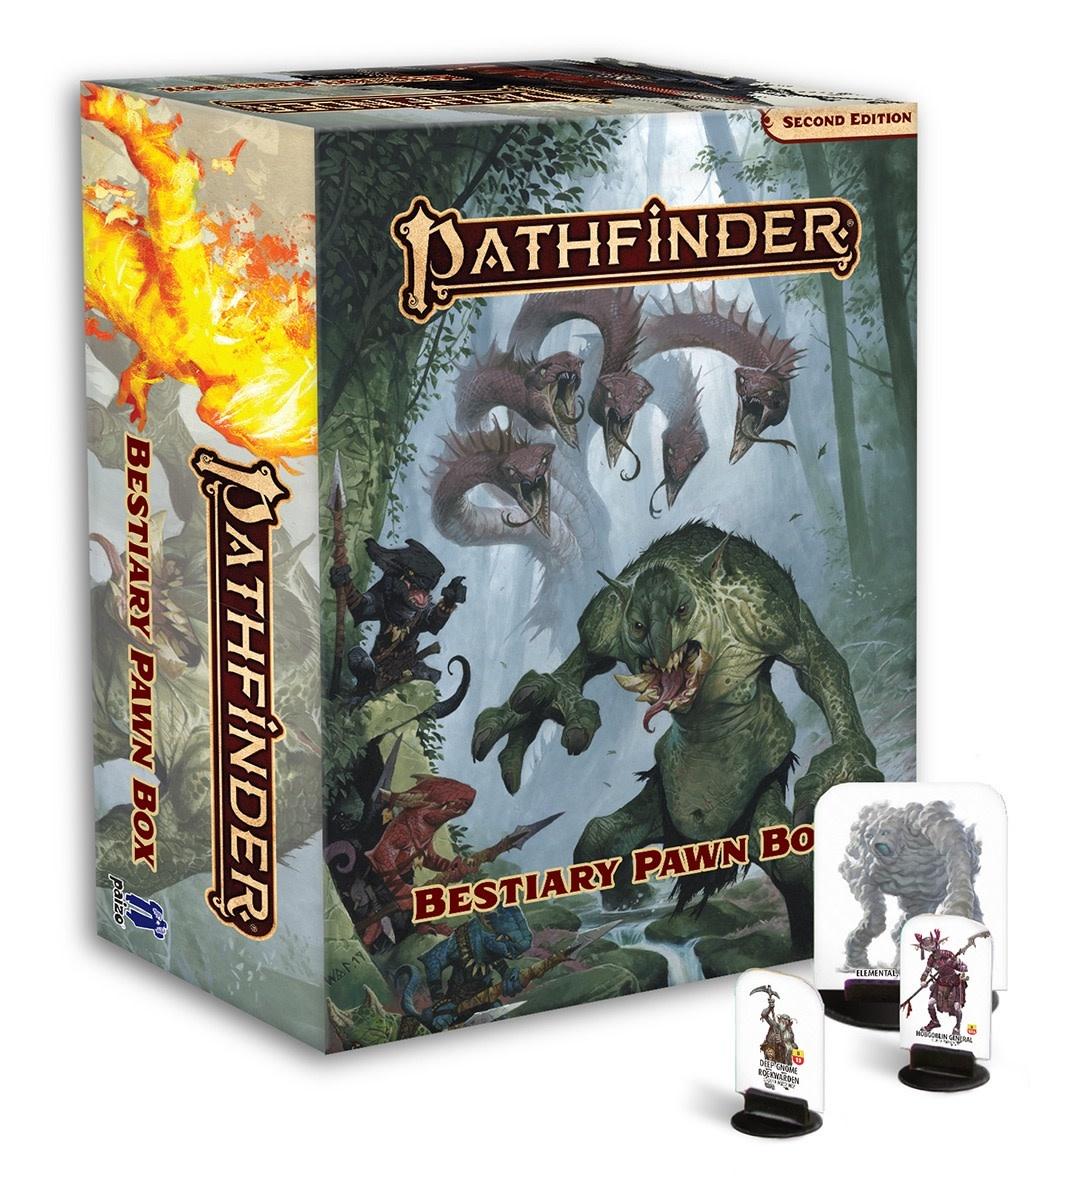 Pathfinder 2: Bestiary Pawn Box